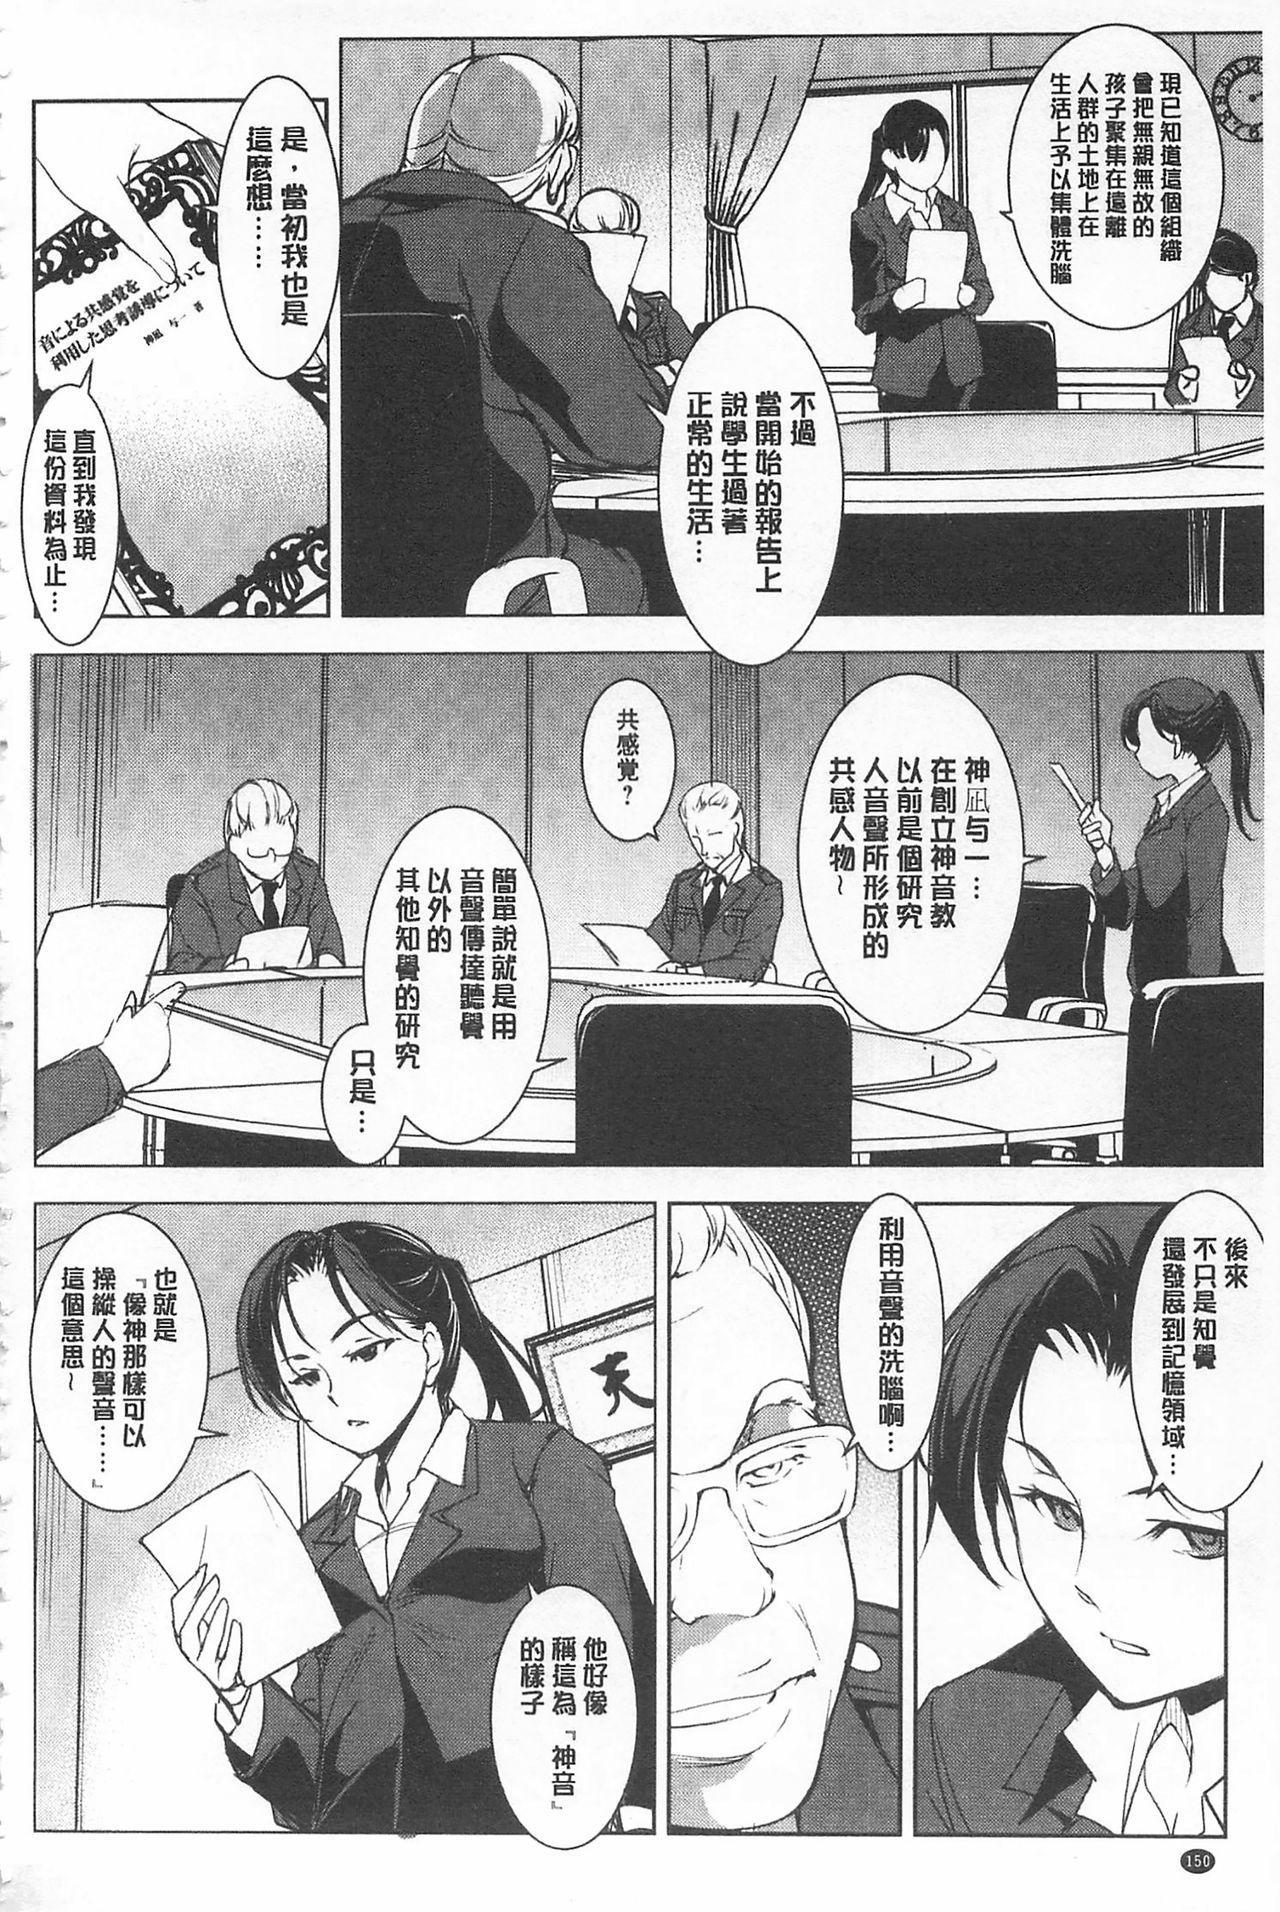 [Amano Kazumi] Seida Inyou -Seijo no Katachi Shita Intou- | 聖墮陰陽 -聖女的容貌與淫蕩- [Chinese] 153